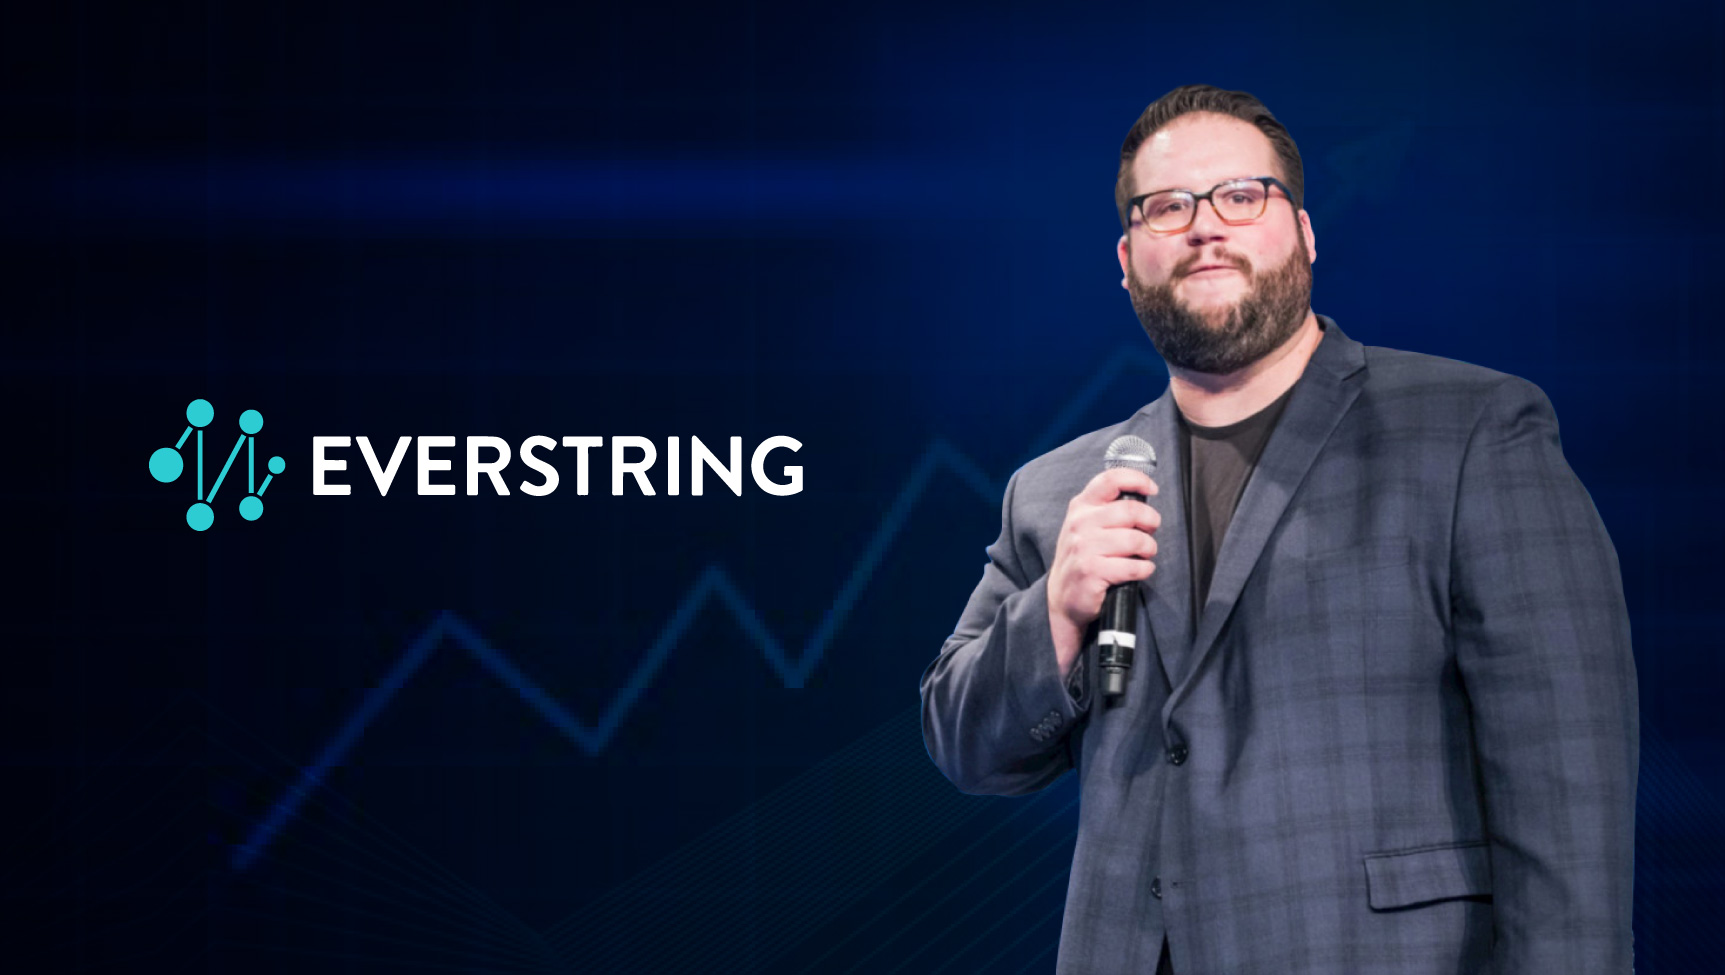 SalesTech Interview with Matt Amundson, VP of Marketing at EverString